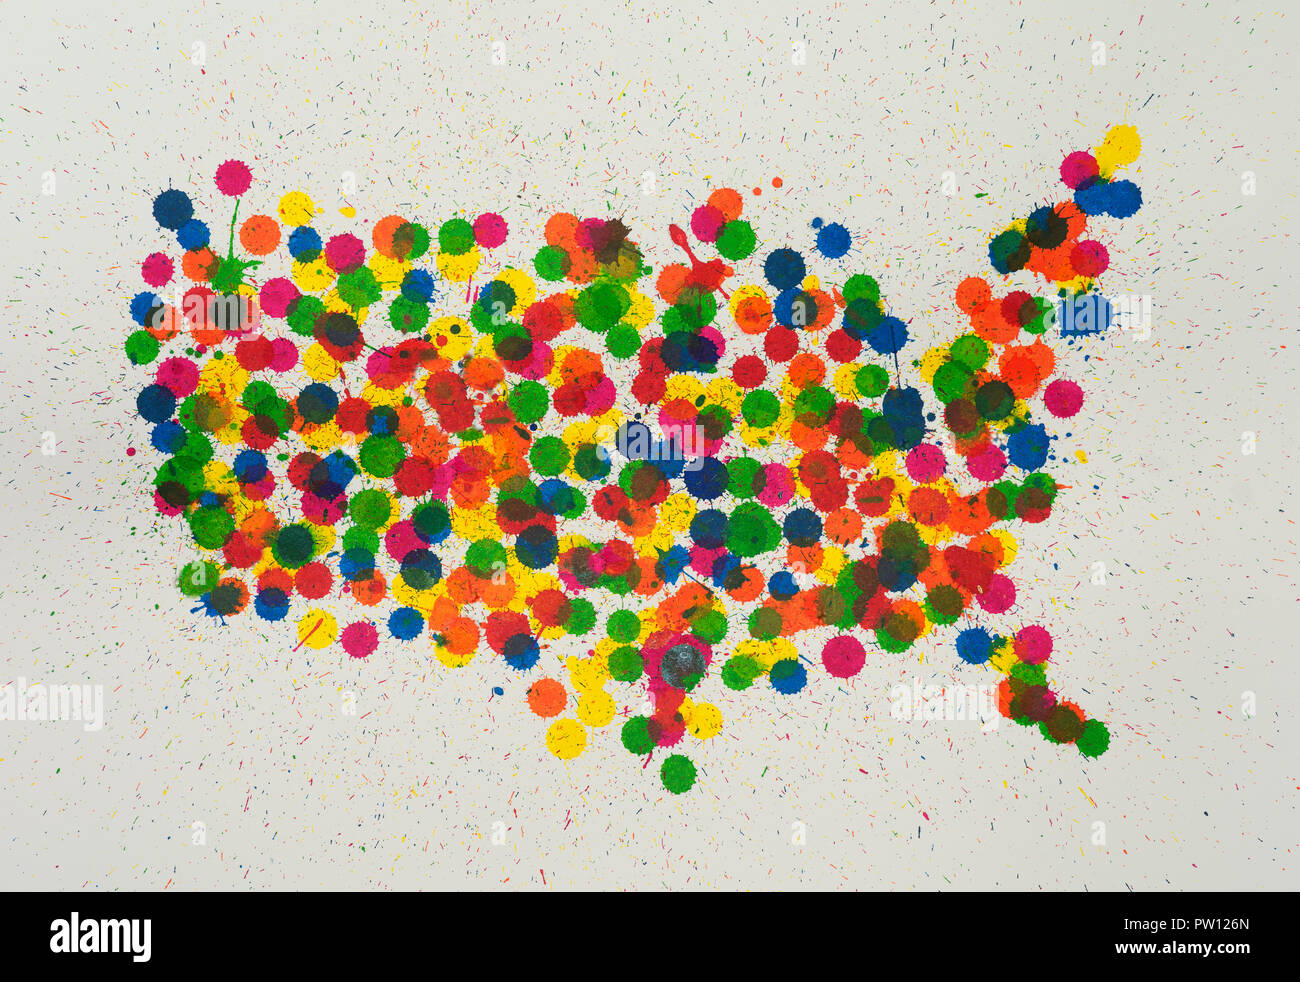 Konzept USA Karte aus Farbe tropft abfällt, mehrfarbige Karte, Vielfalt, United States Stockbild